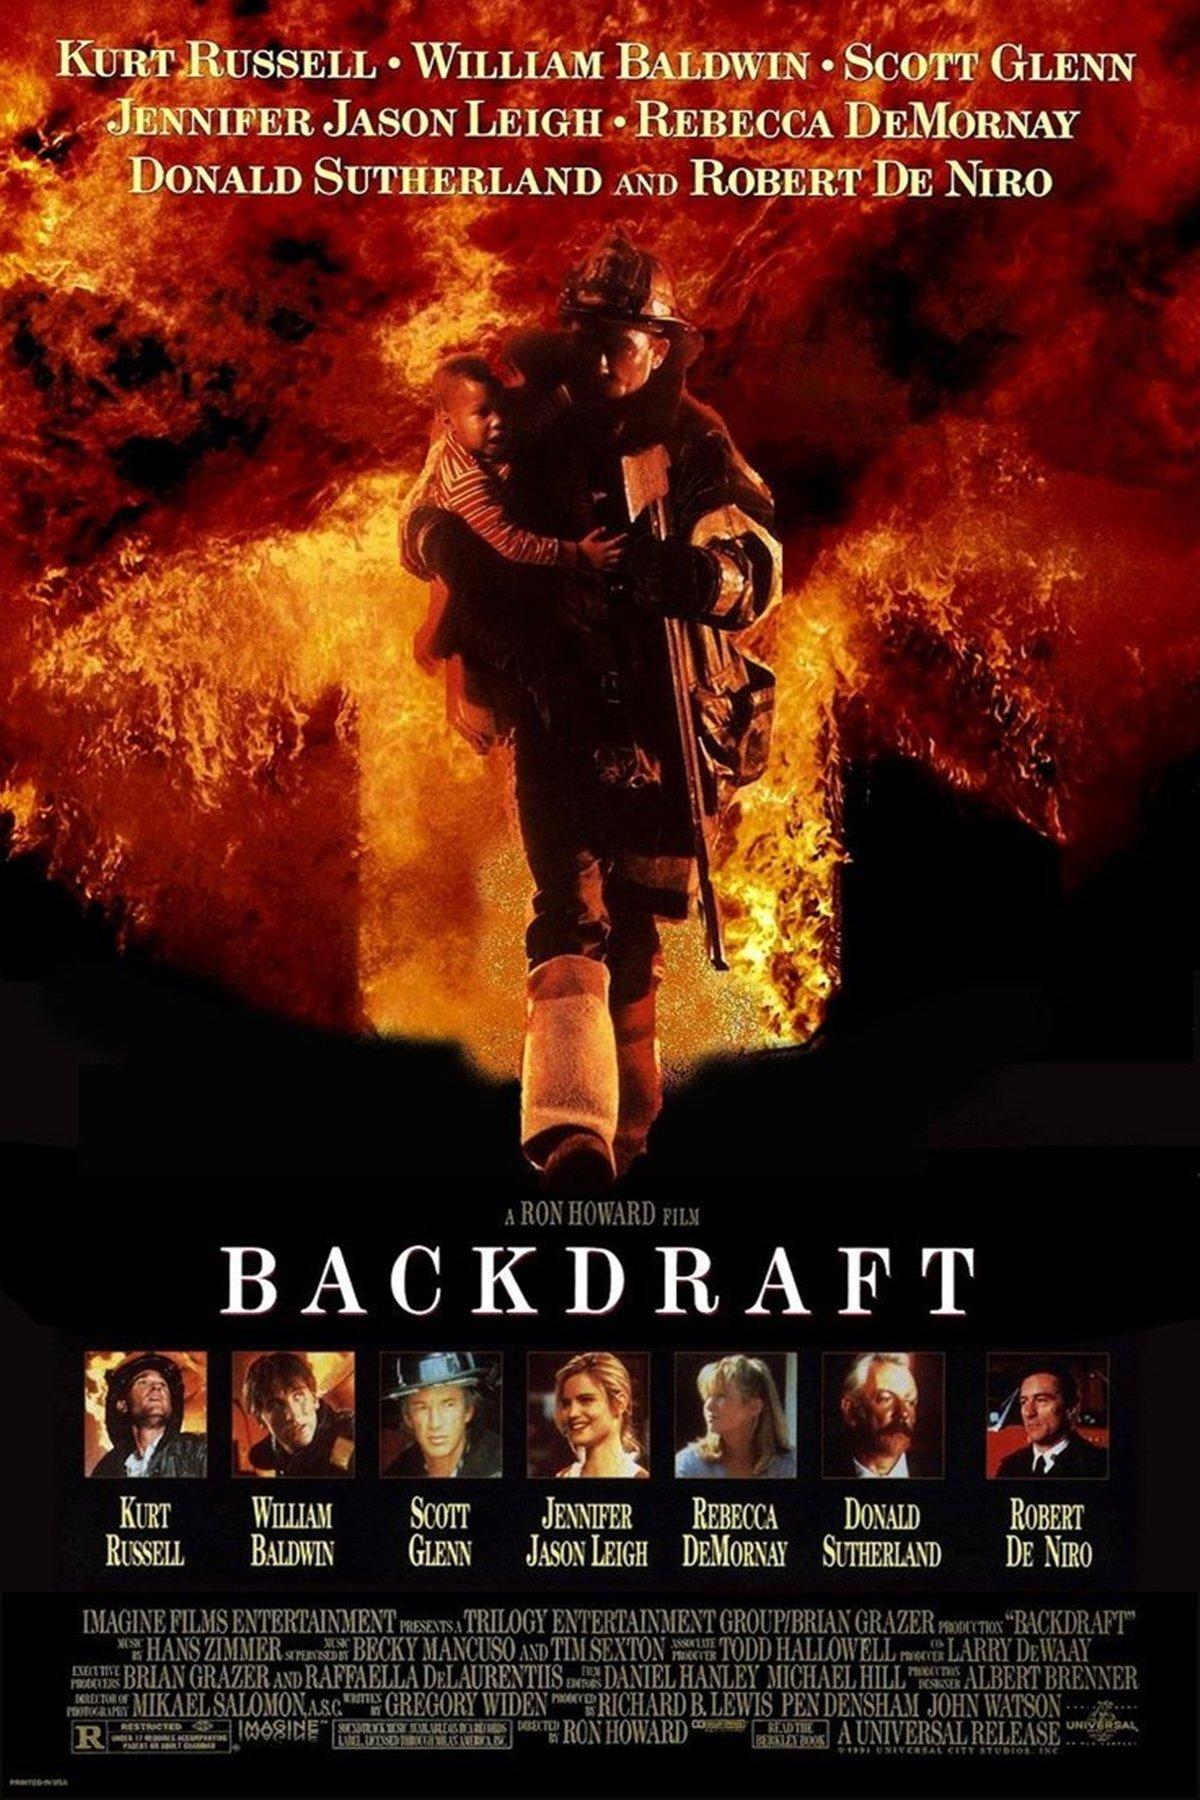 The poster for Backdraft